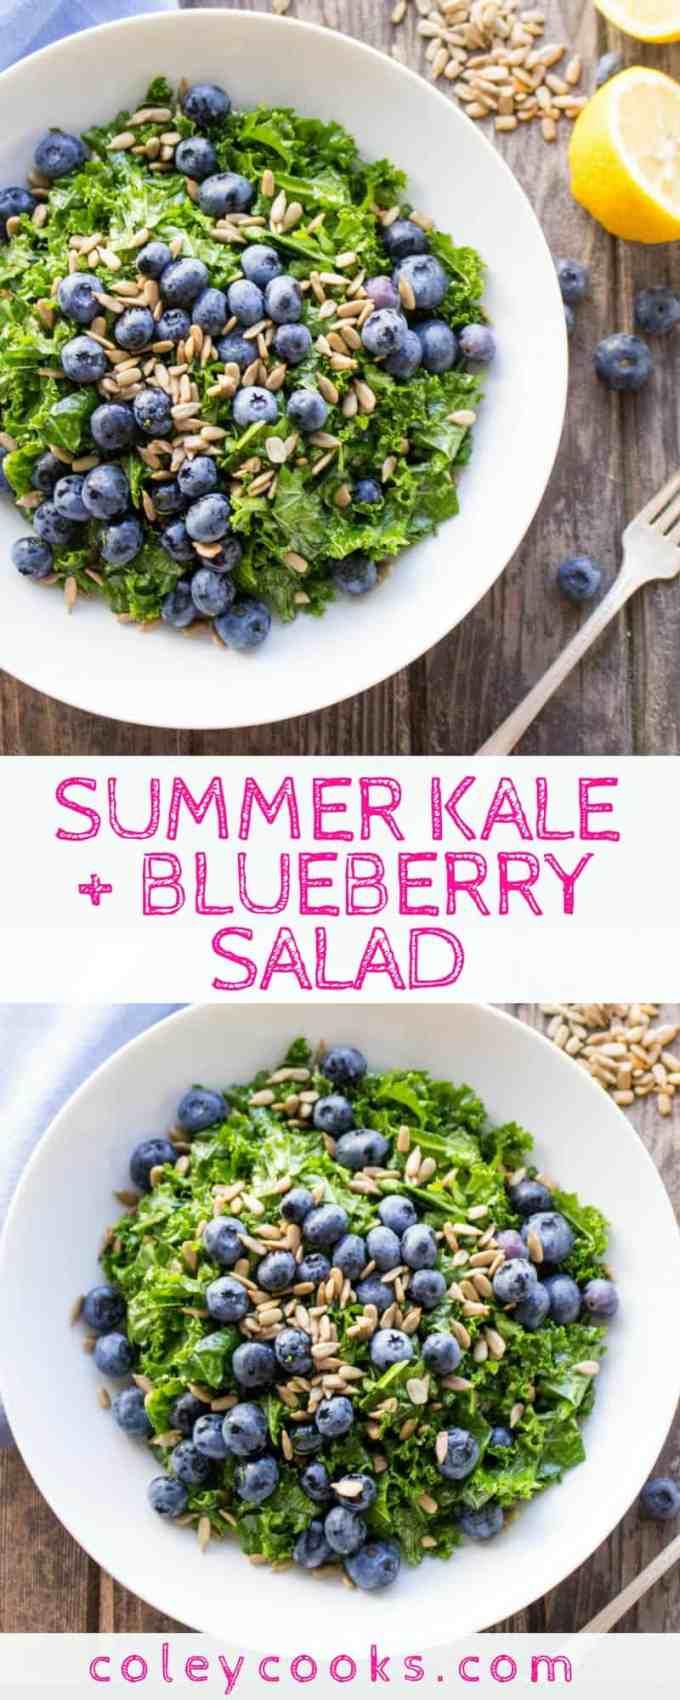 SUMMER KALE + BLUEBERRY SALAD | Easiest ever summer salad recipe with a simple honey lemon vinaigrette, crunchy sunflower seeds, sweet blueberries and massaged kale! #glutenfree #vegan #plantbased #paleo | ColeyCooks.com